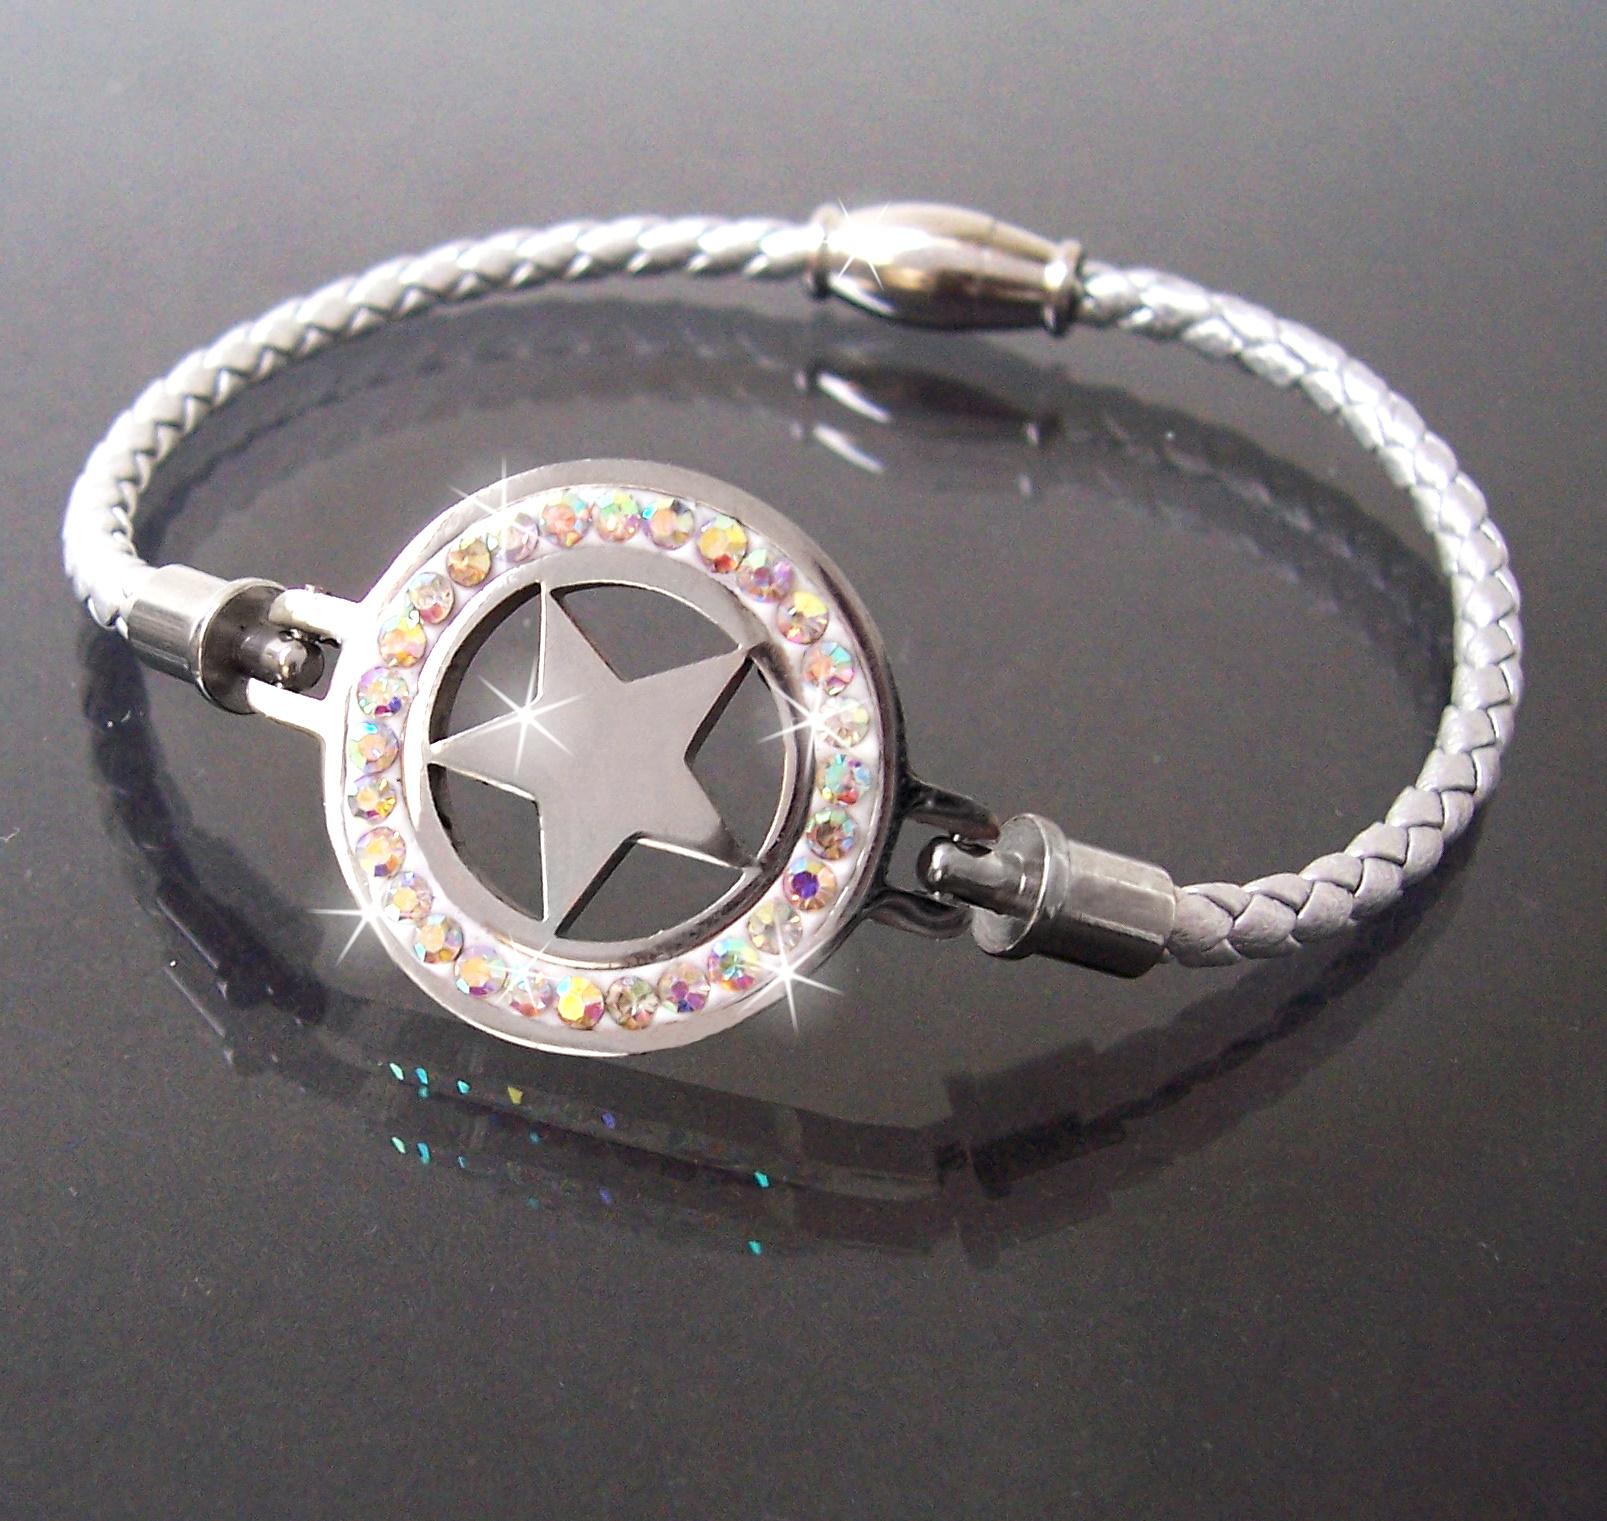 Armband Leder silber Edelstahl Magnet Stern Strass Damen A77747